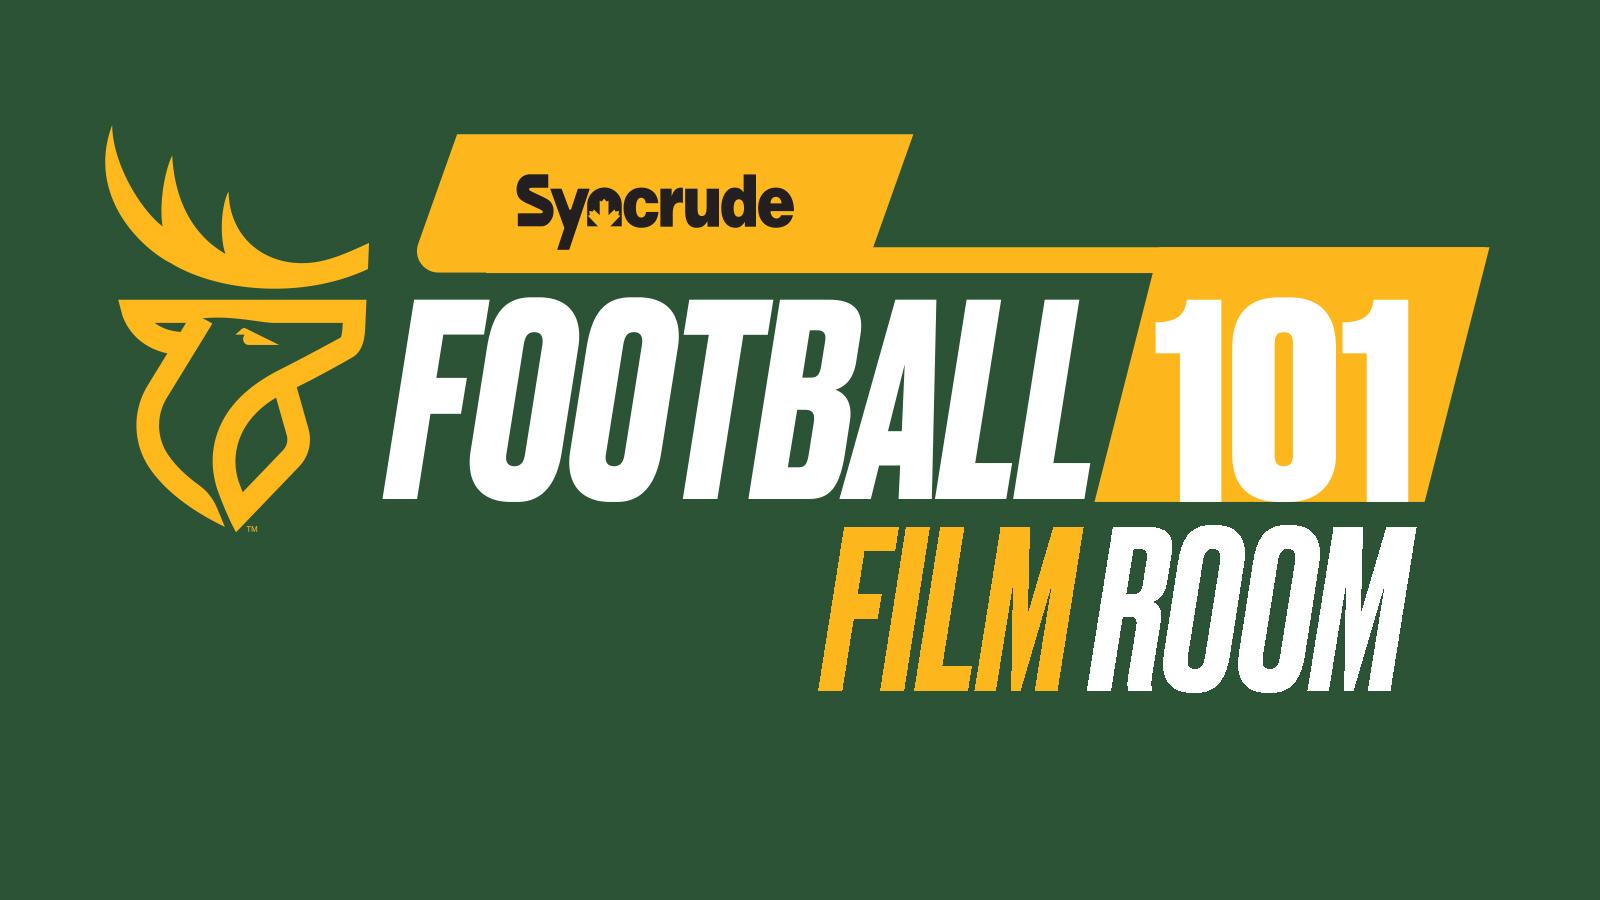 Syncrude Football 101 - Film Room Edition